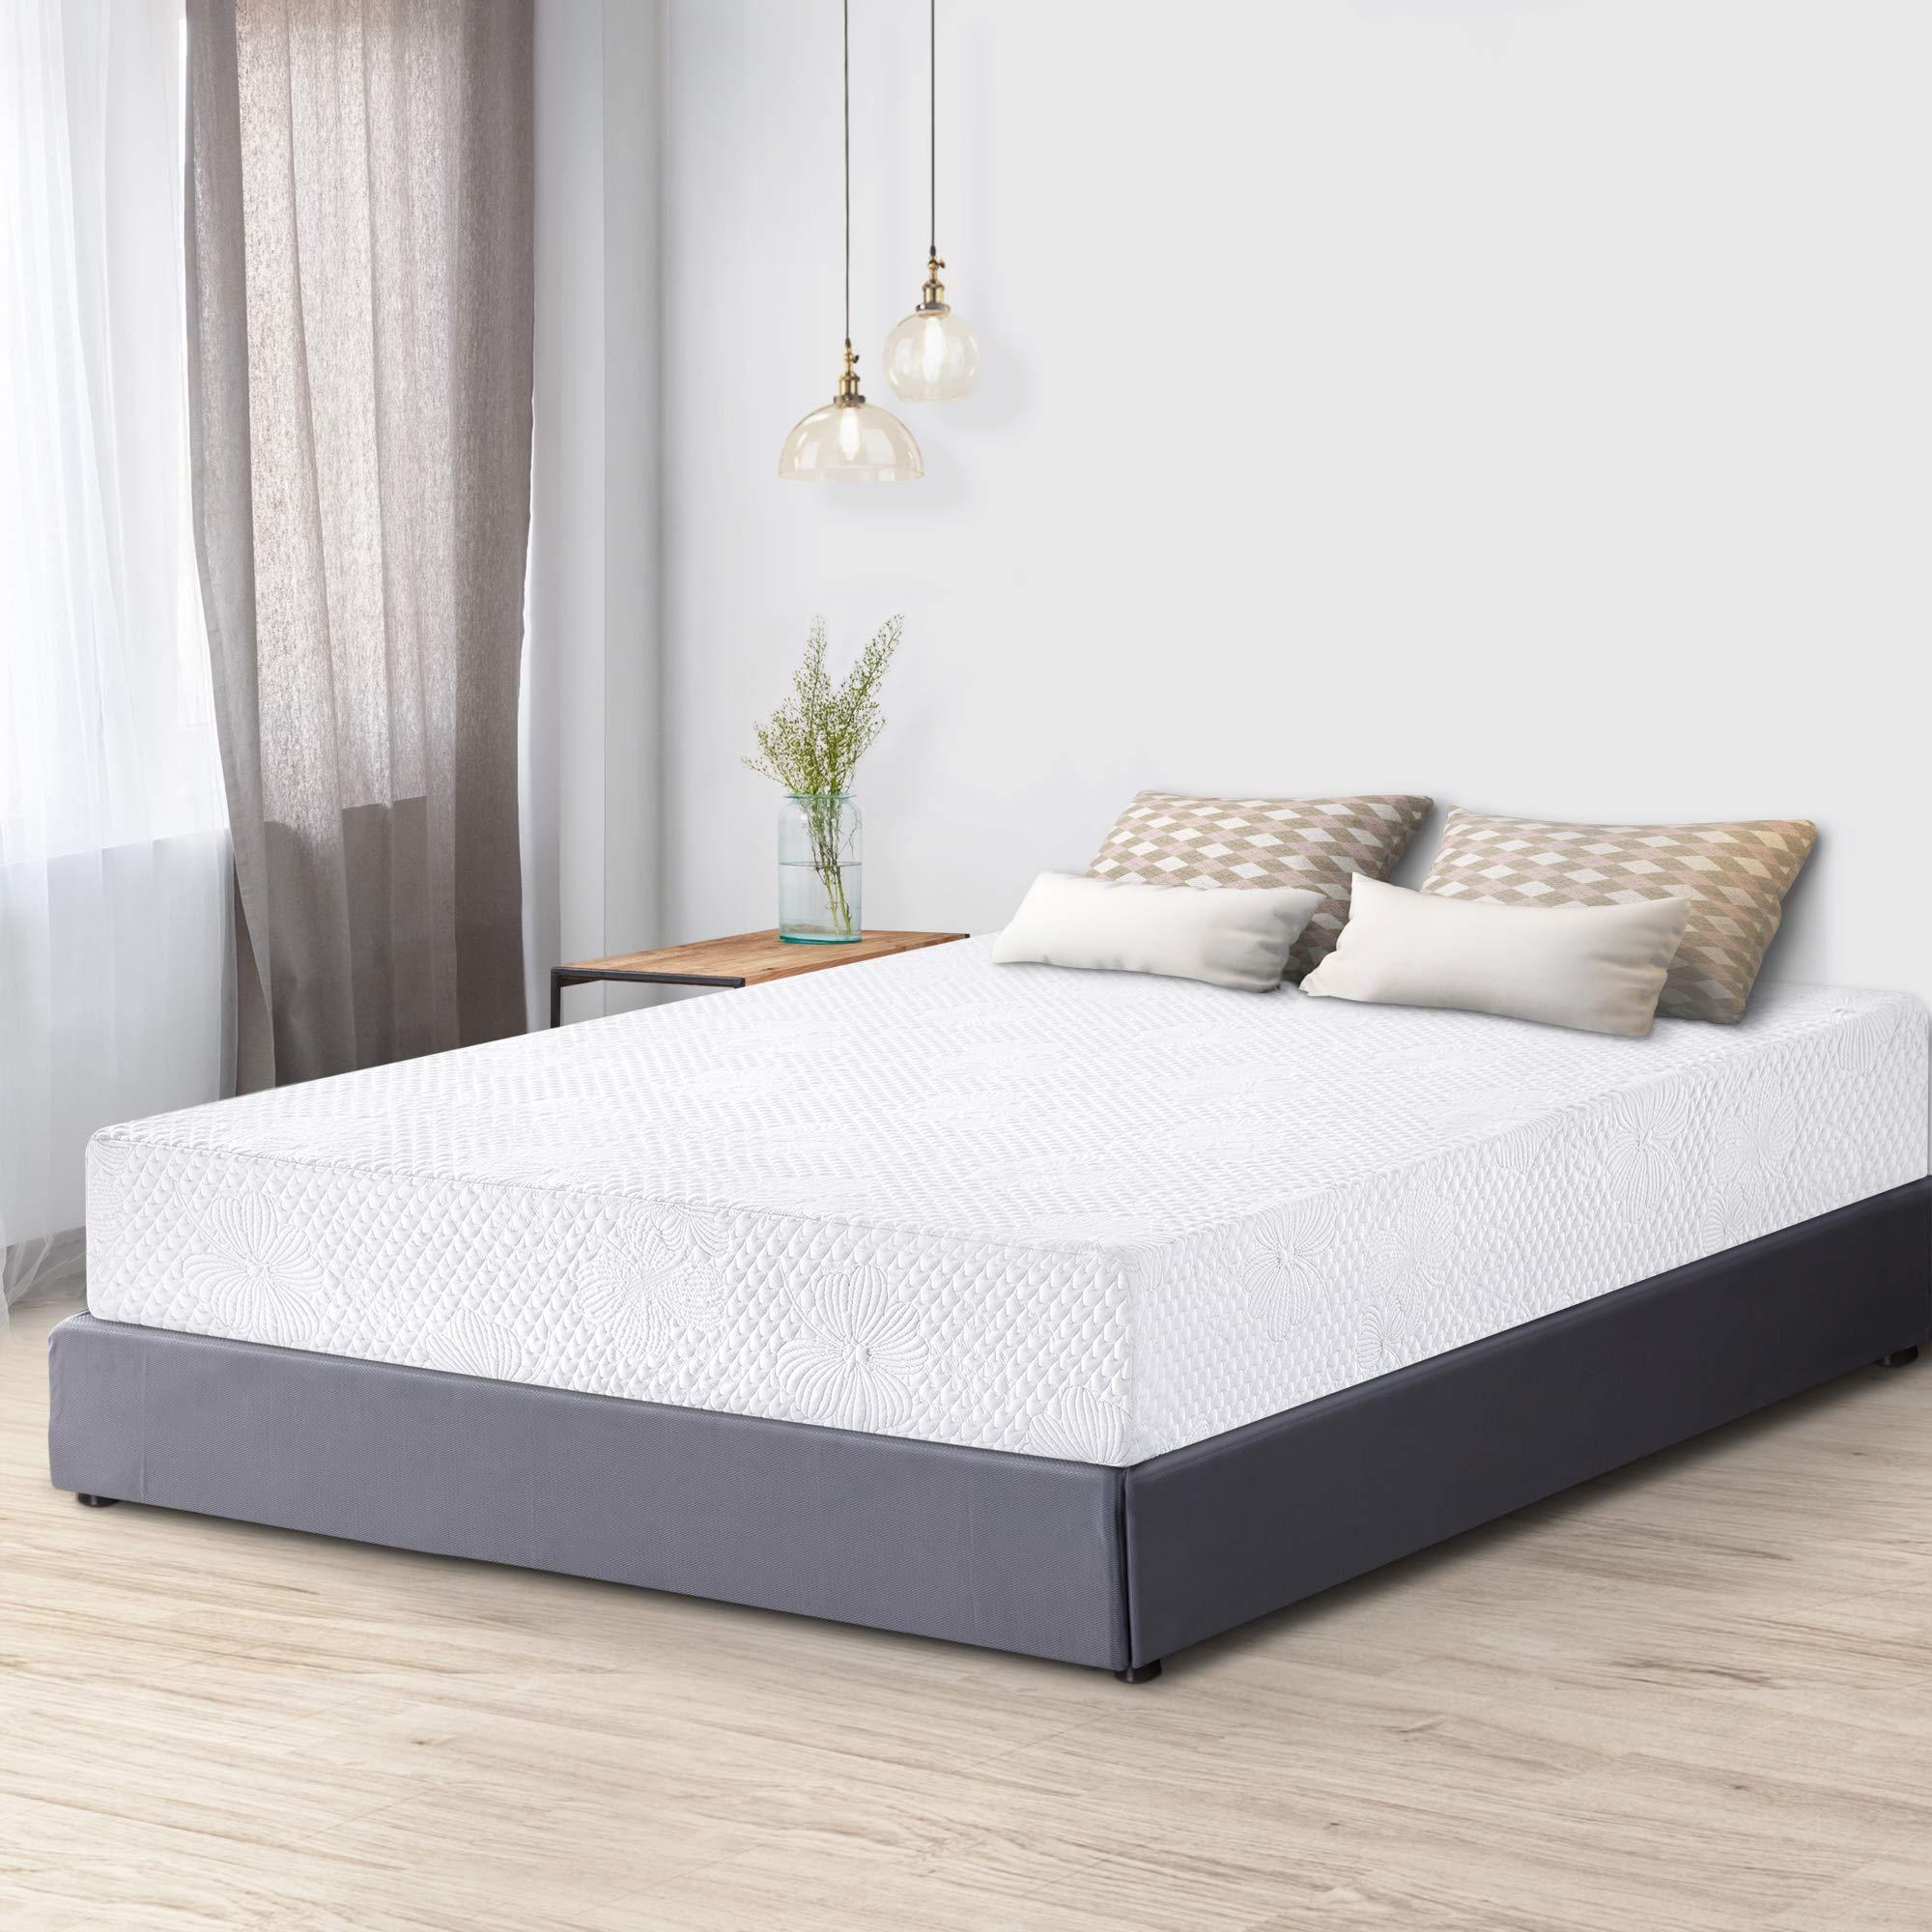 PrimaSleep Premium Cool Gel Multi Layered Memory Foam Bed Mattress, Full, 8 Inch by PrimaSleep